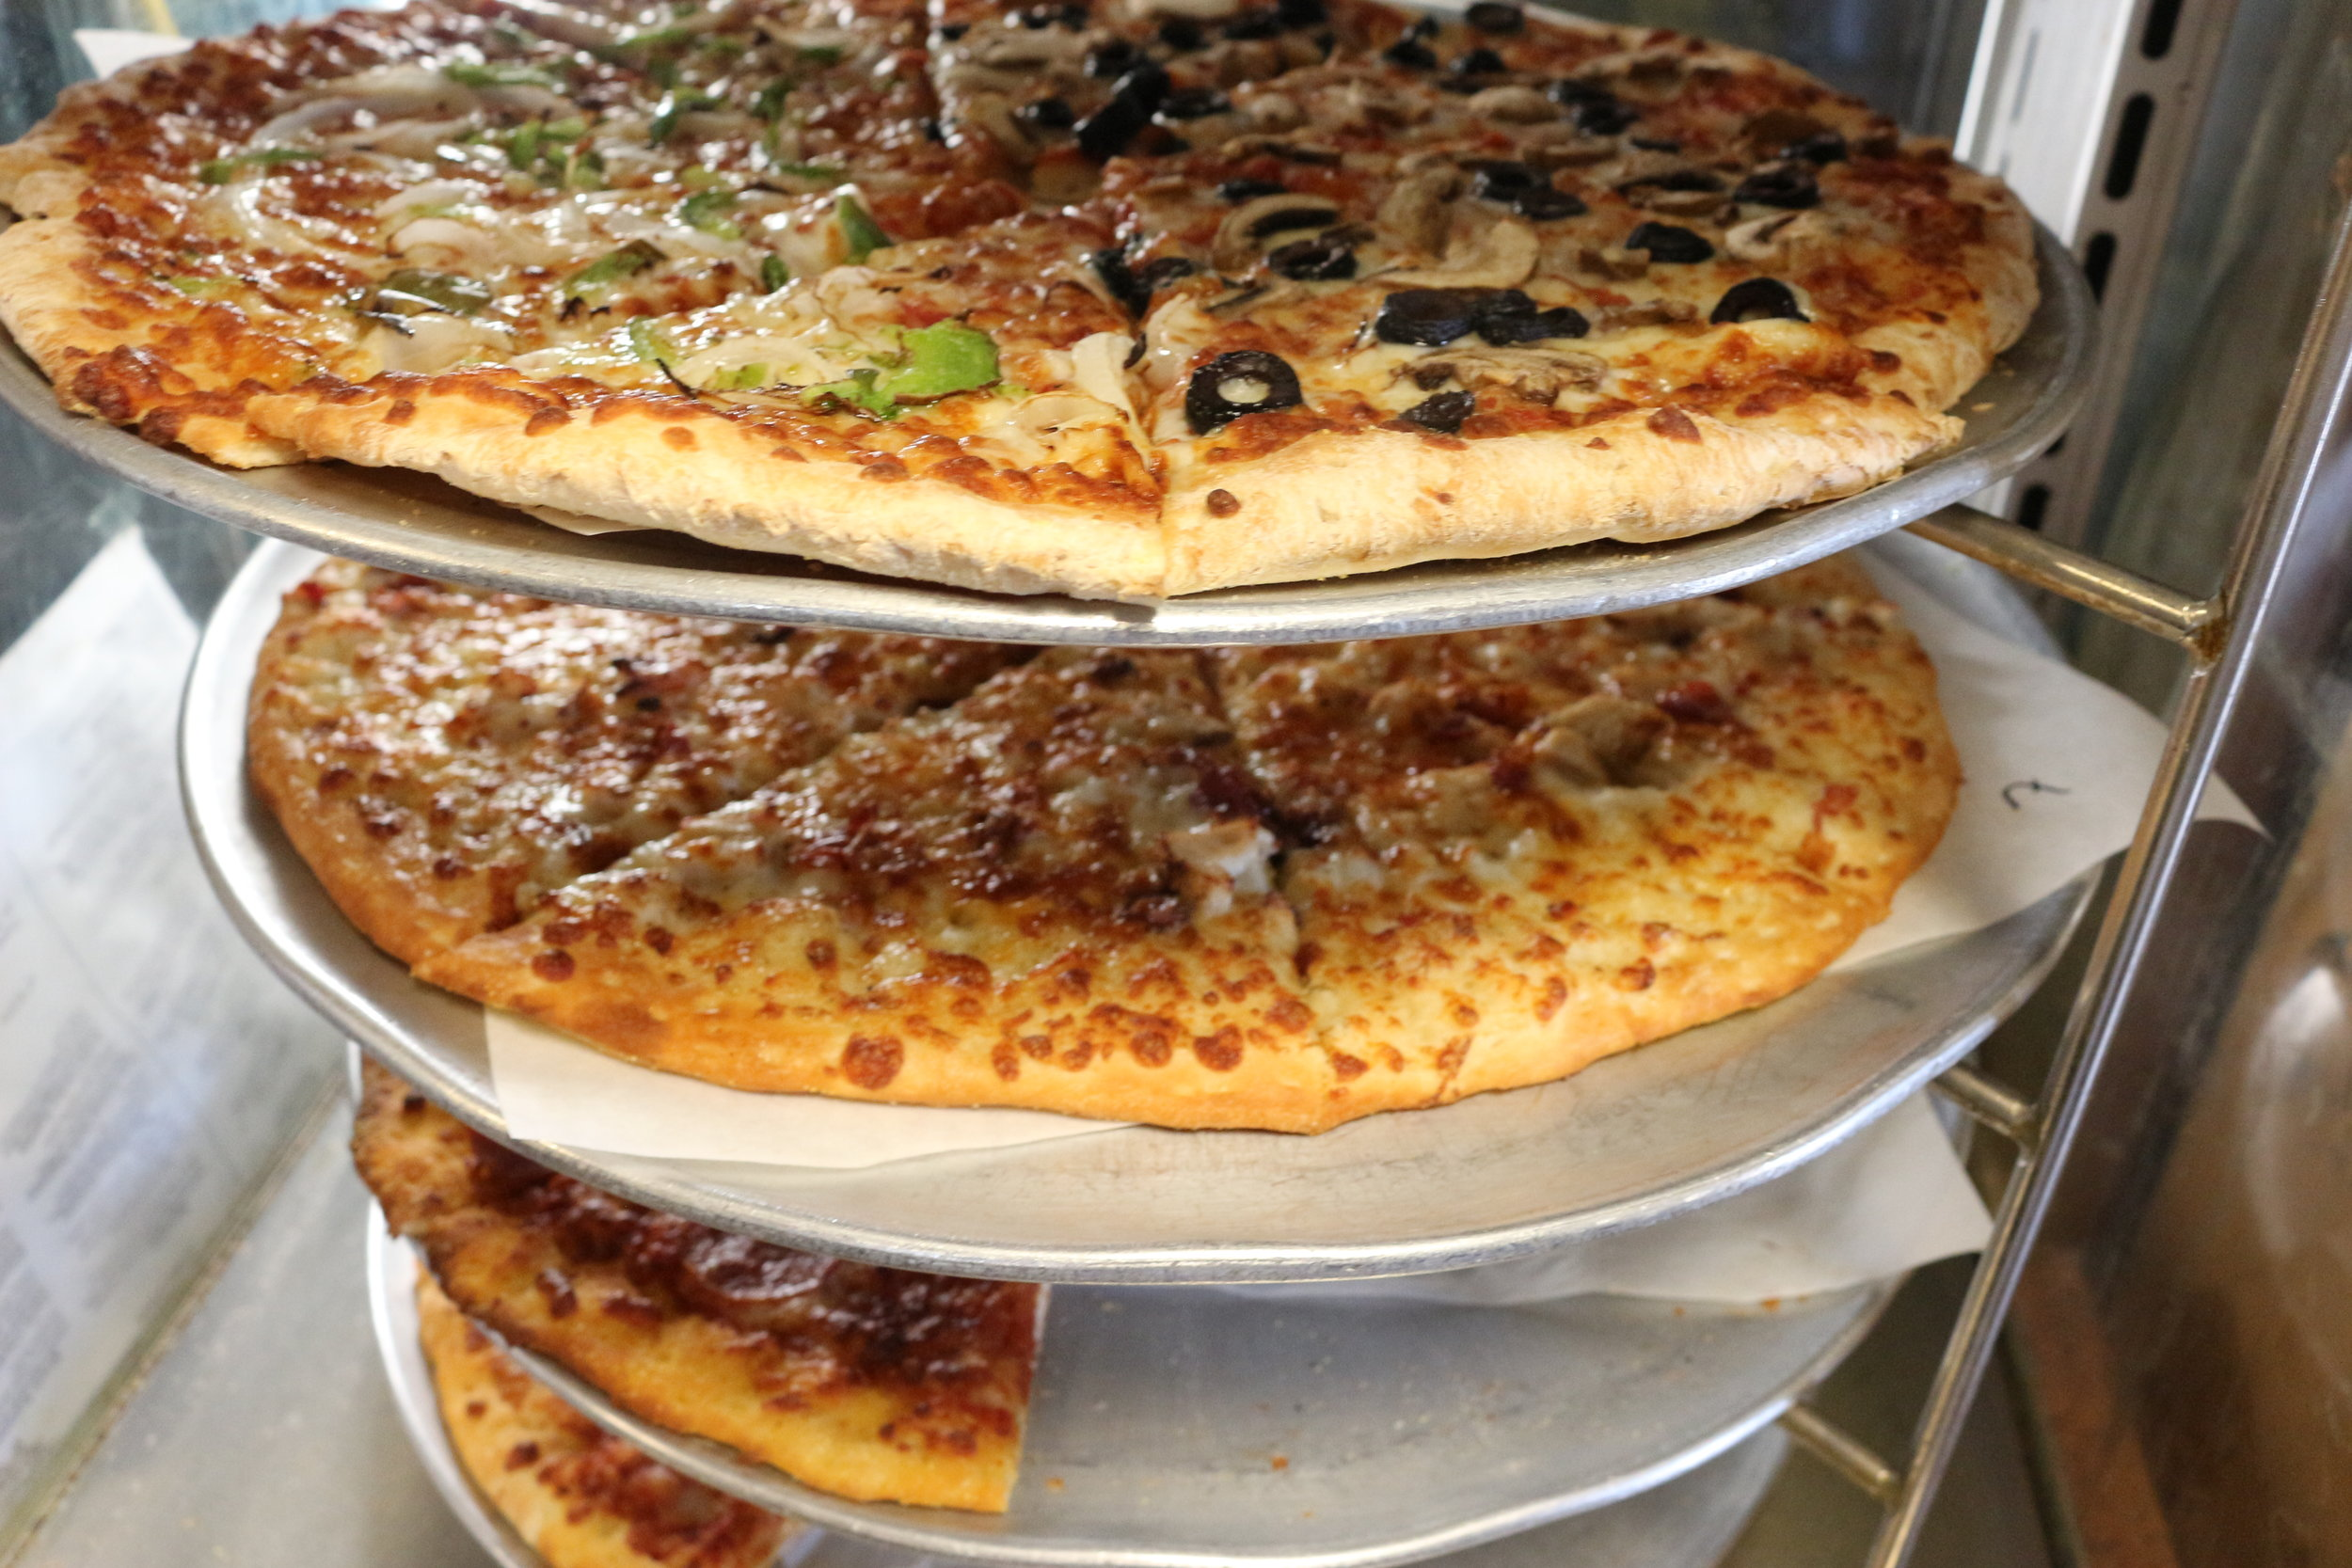 Mckay's Taphouse &Pizzerria - By: Francesco Savoy